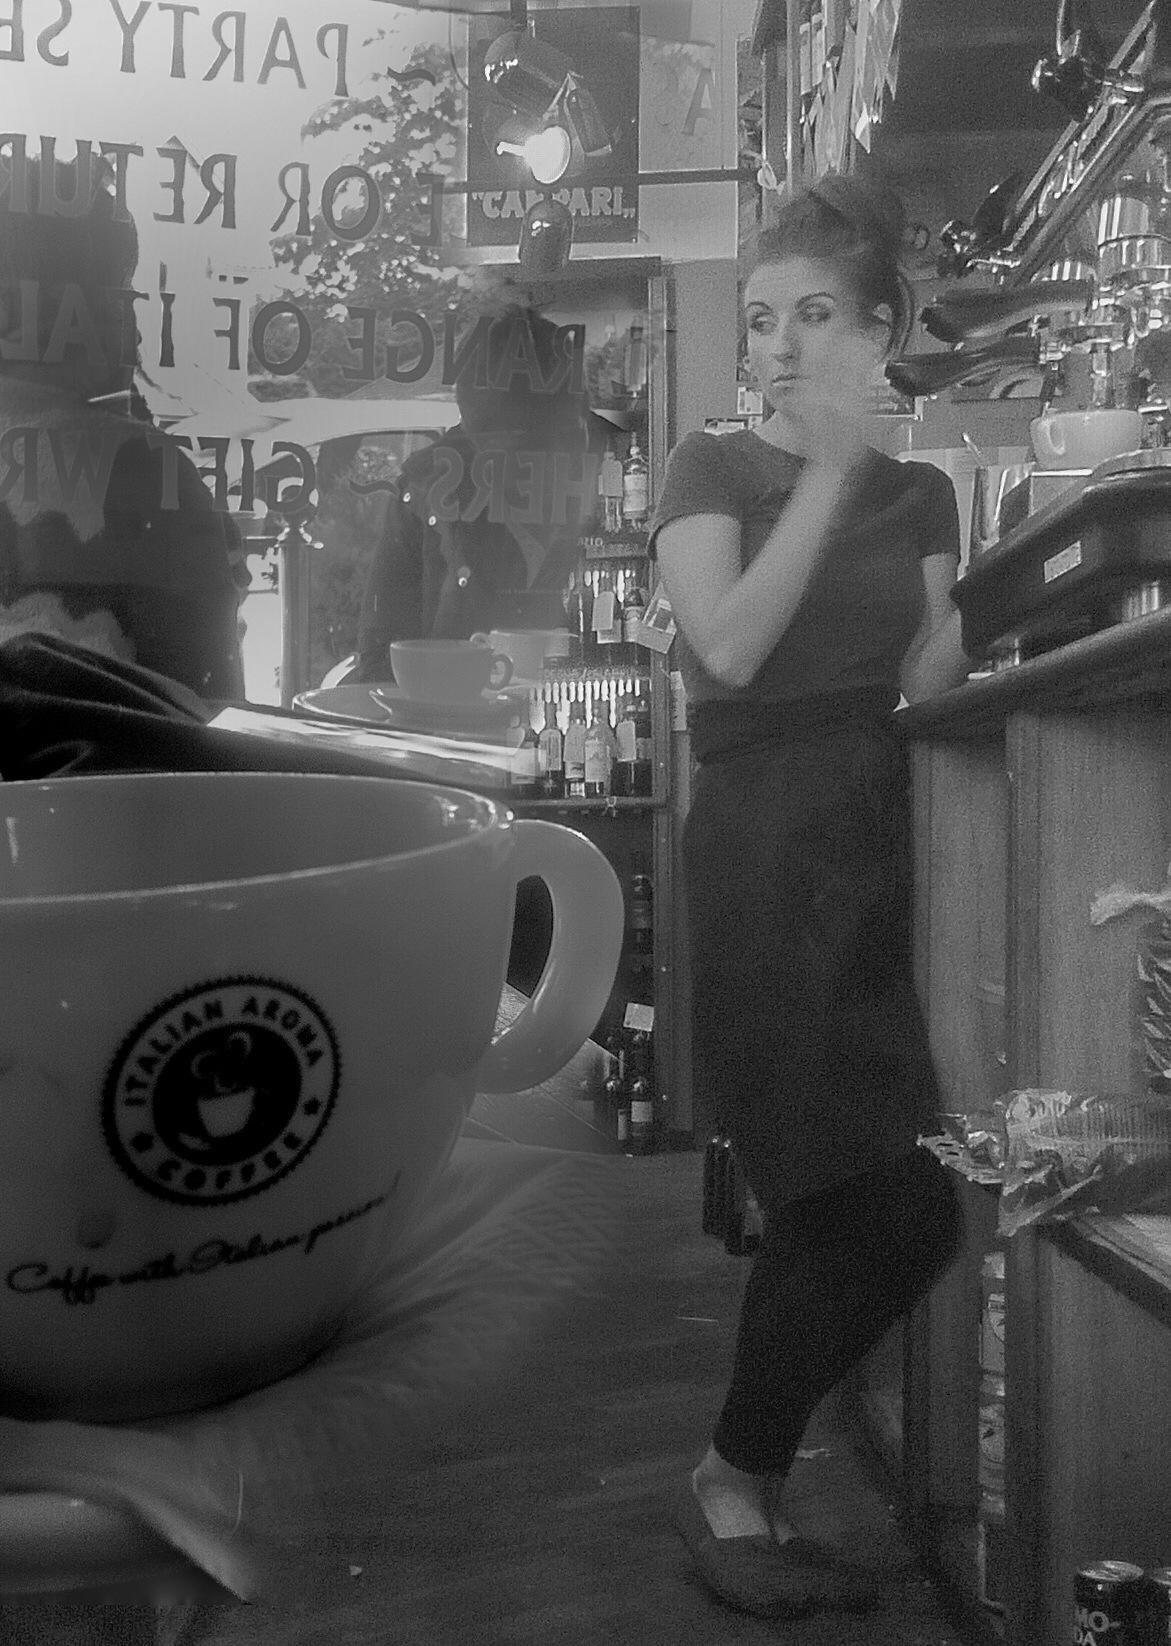 Rush, rush, rush.....the coffee's to tasty by ricardo1